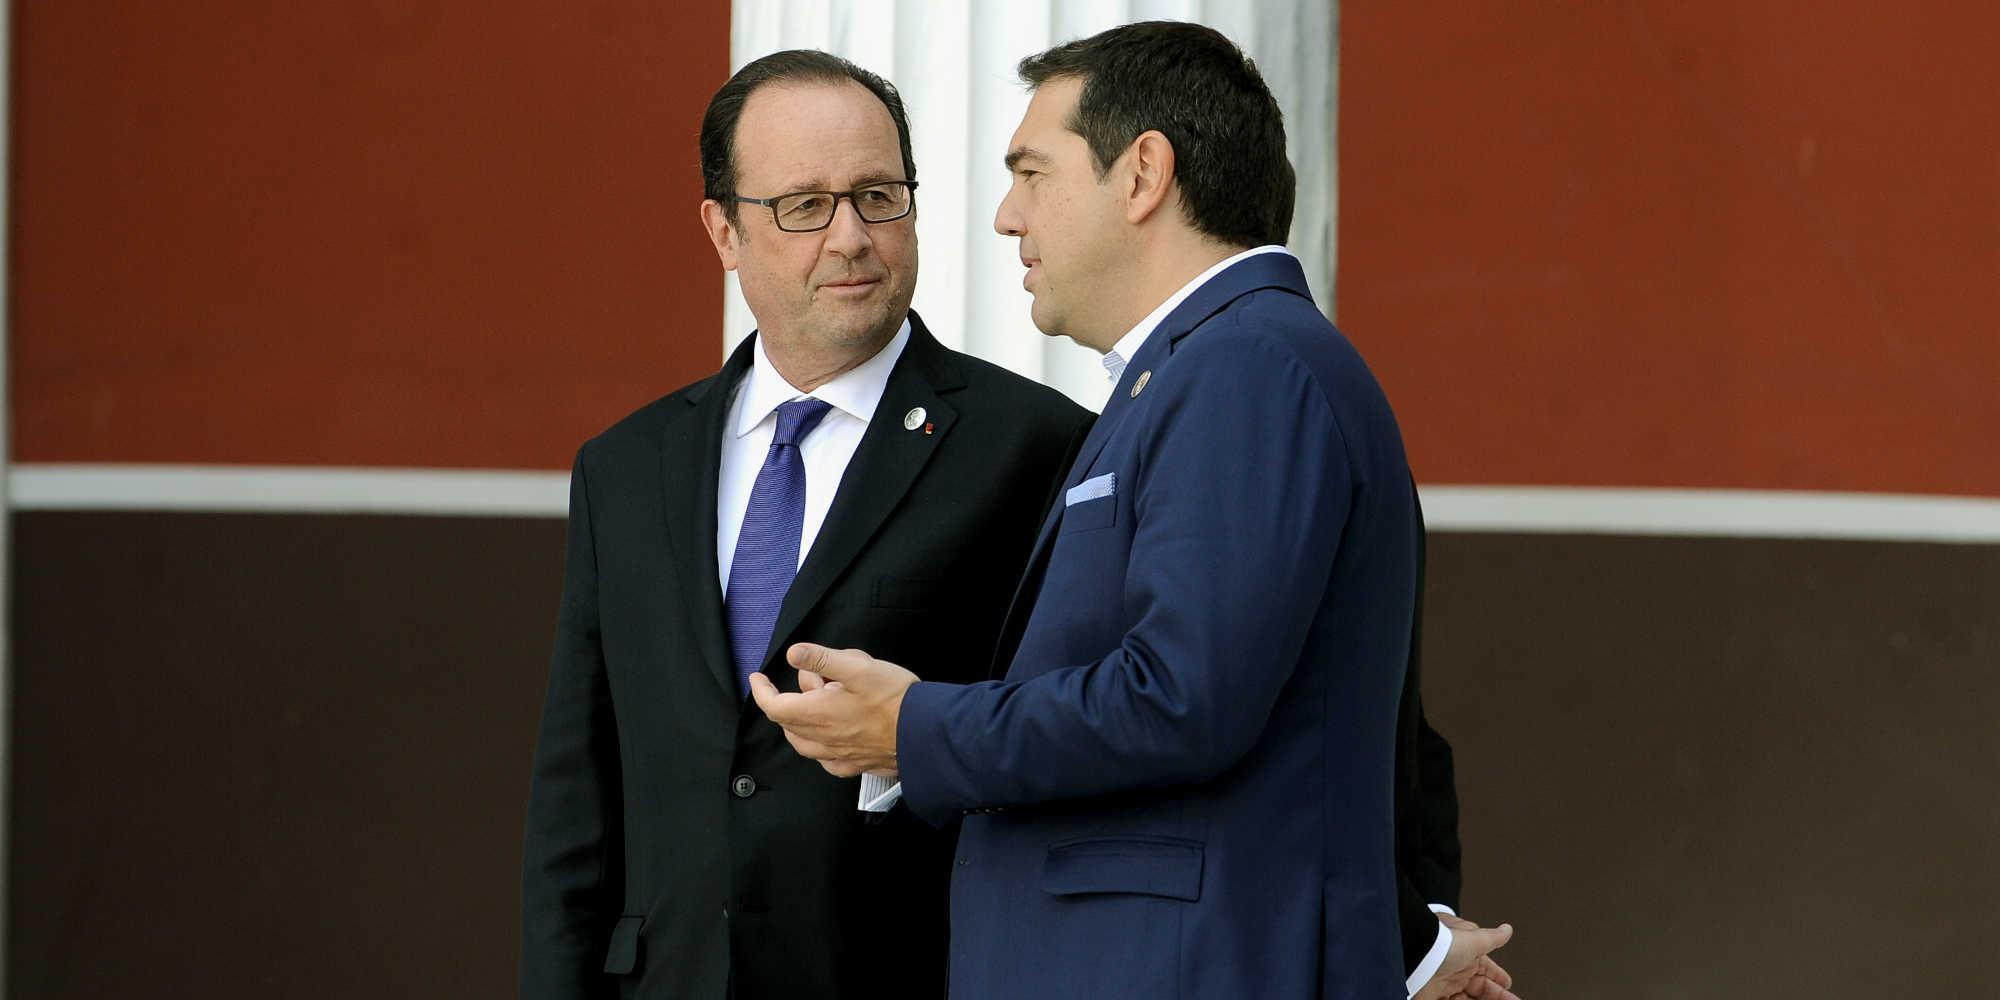 http://www.eleftherostypos.gr/wp-content/uploads/2016/10/tsipras-olant-1300.jpg